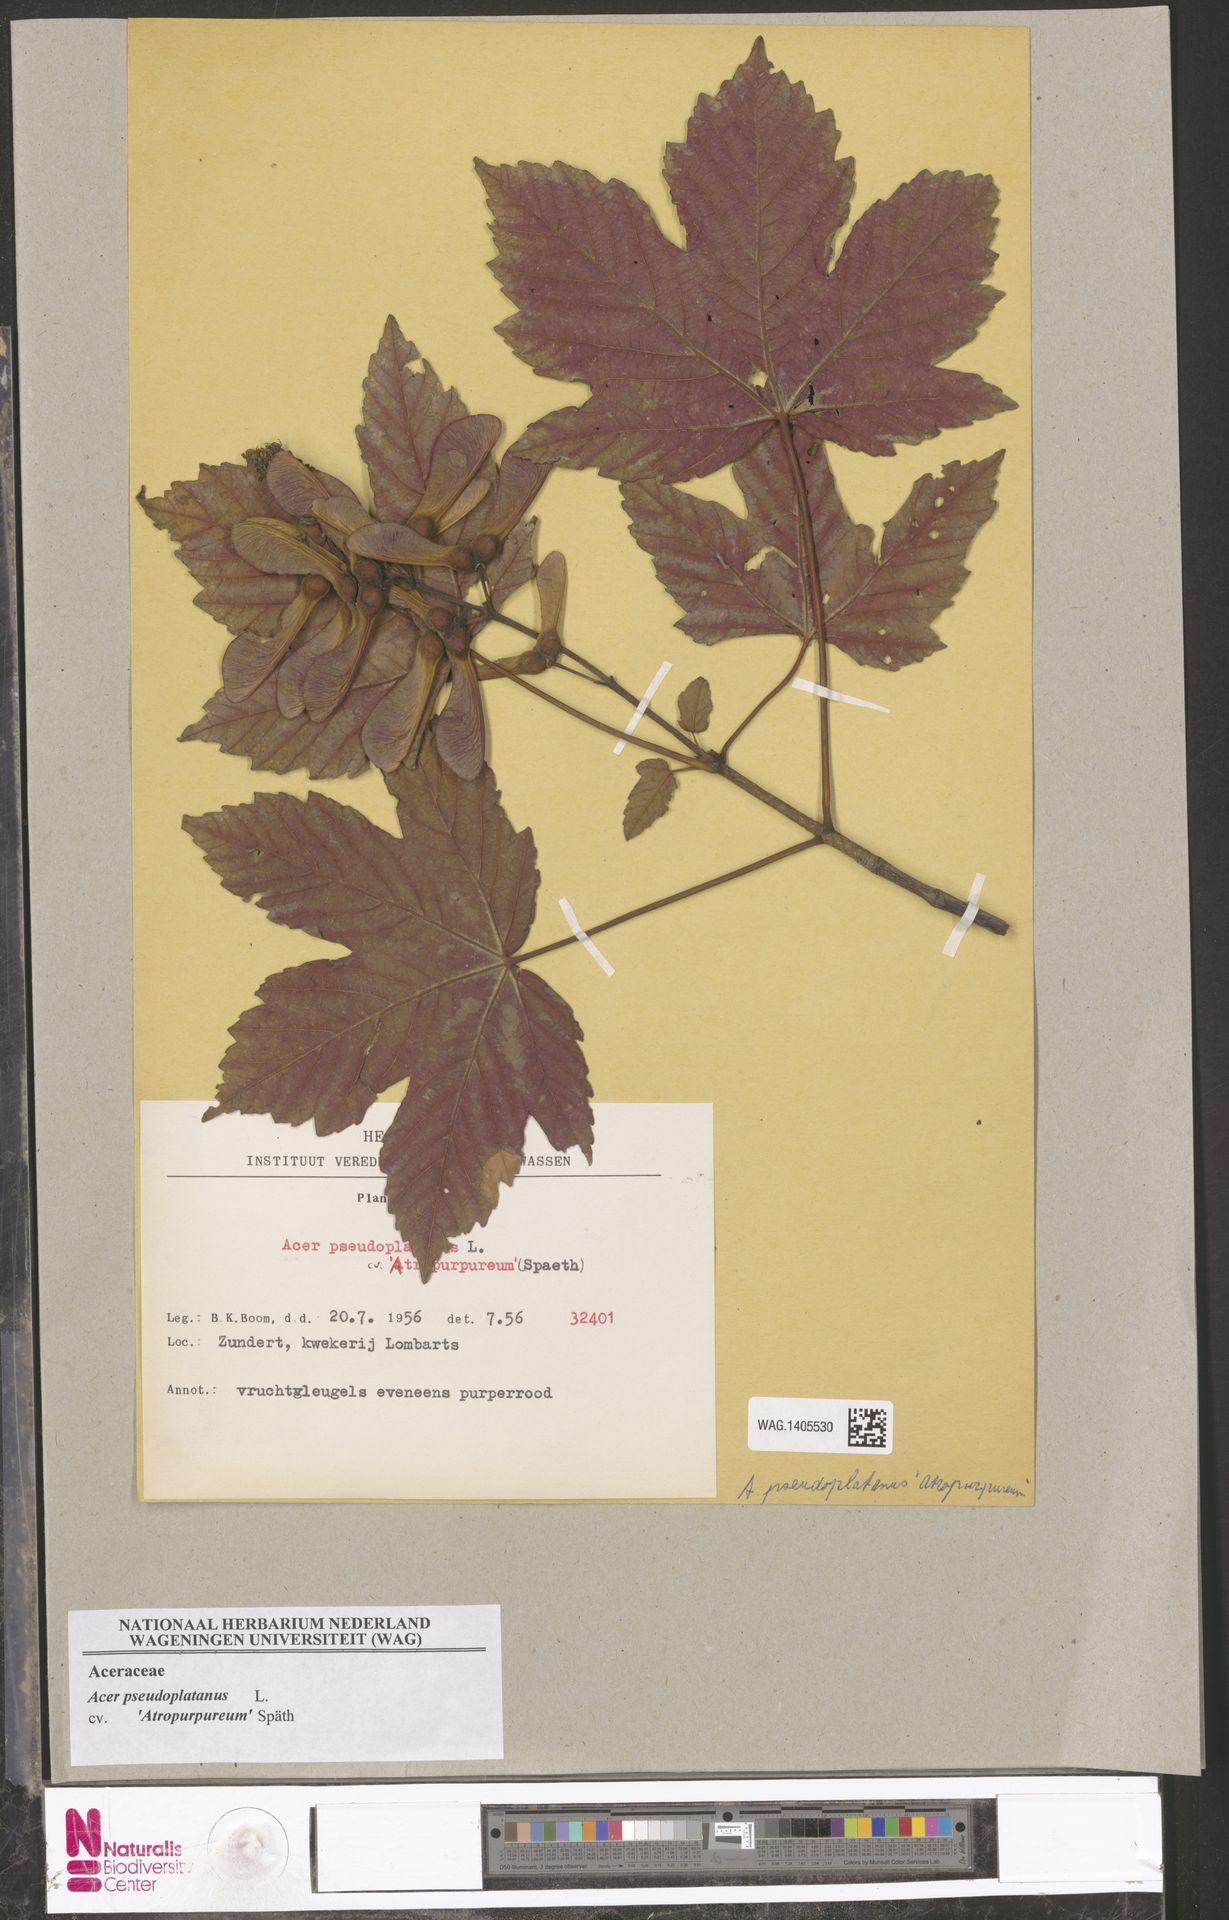 WAG.1405530 | Acer pseudoplatanus cv. 'Atropurpureum' Späth